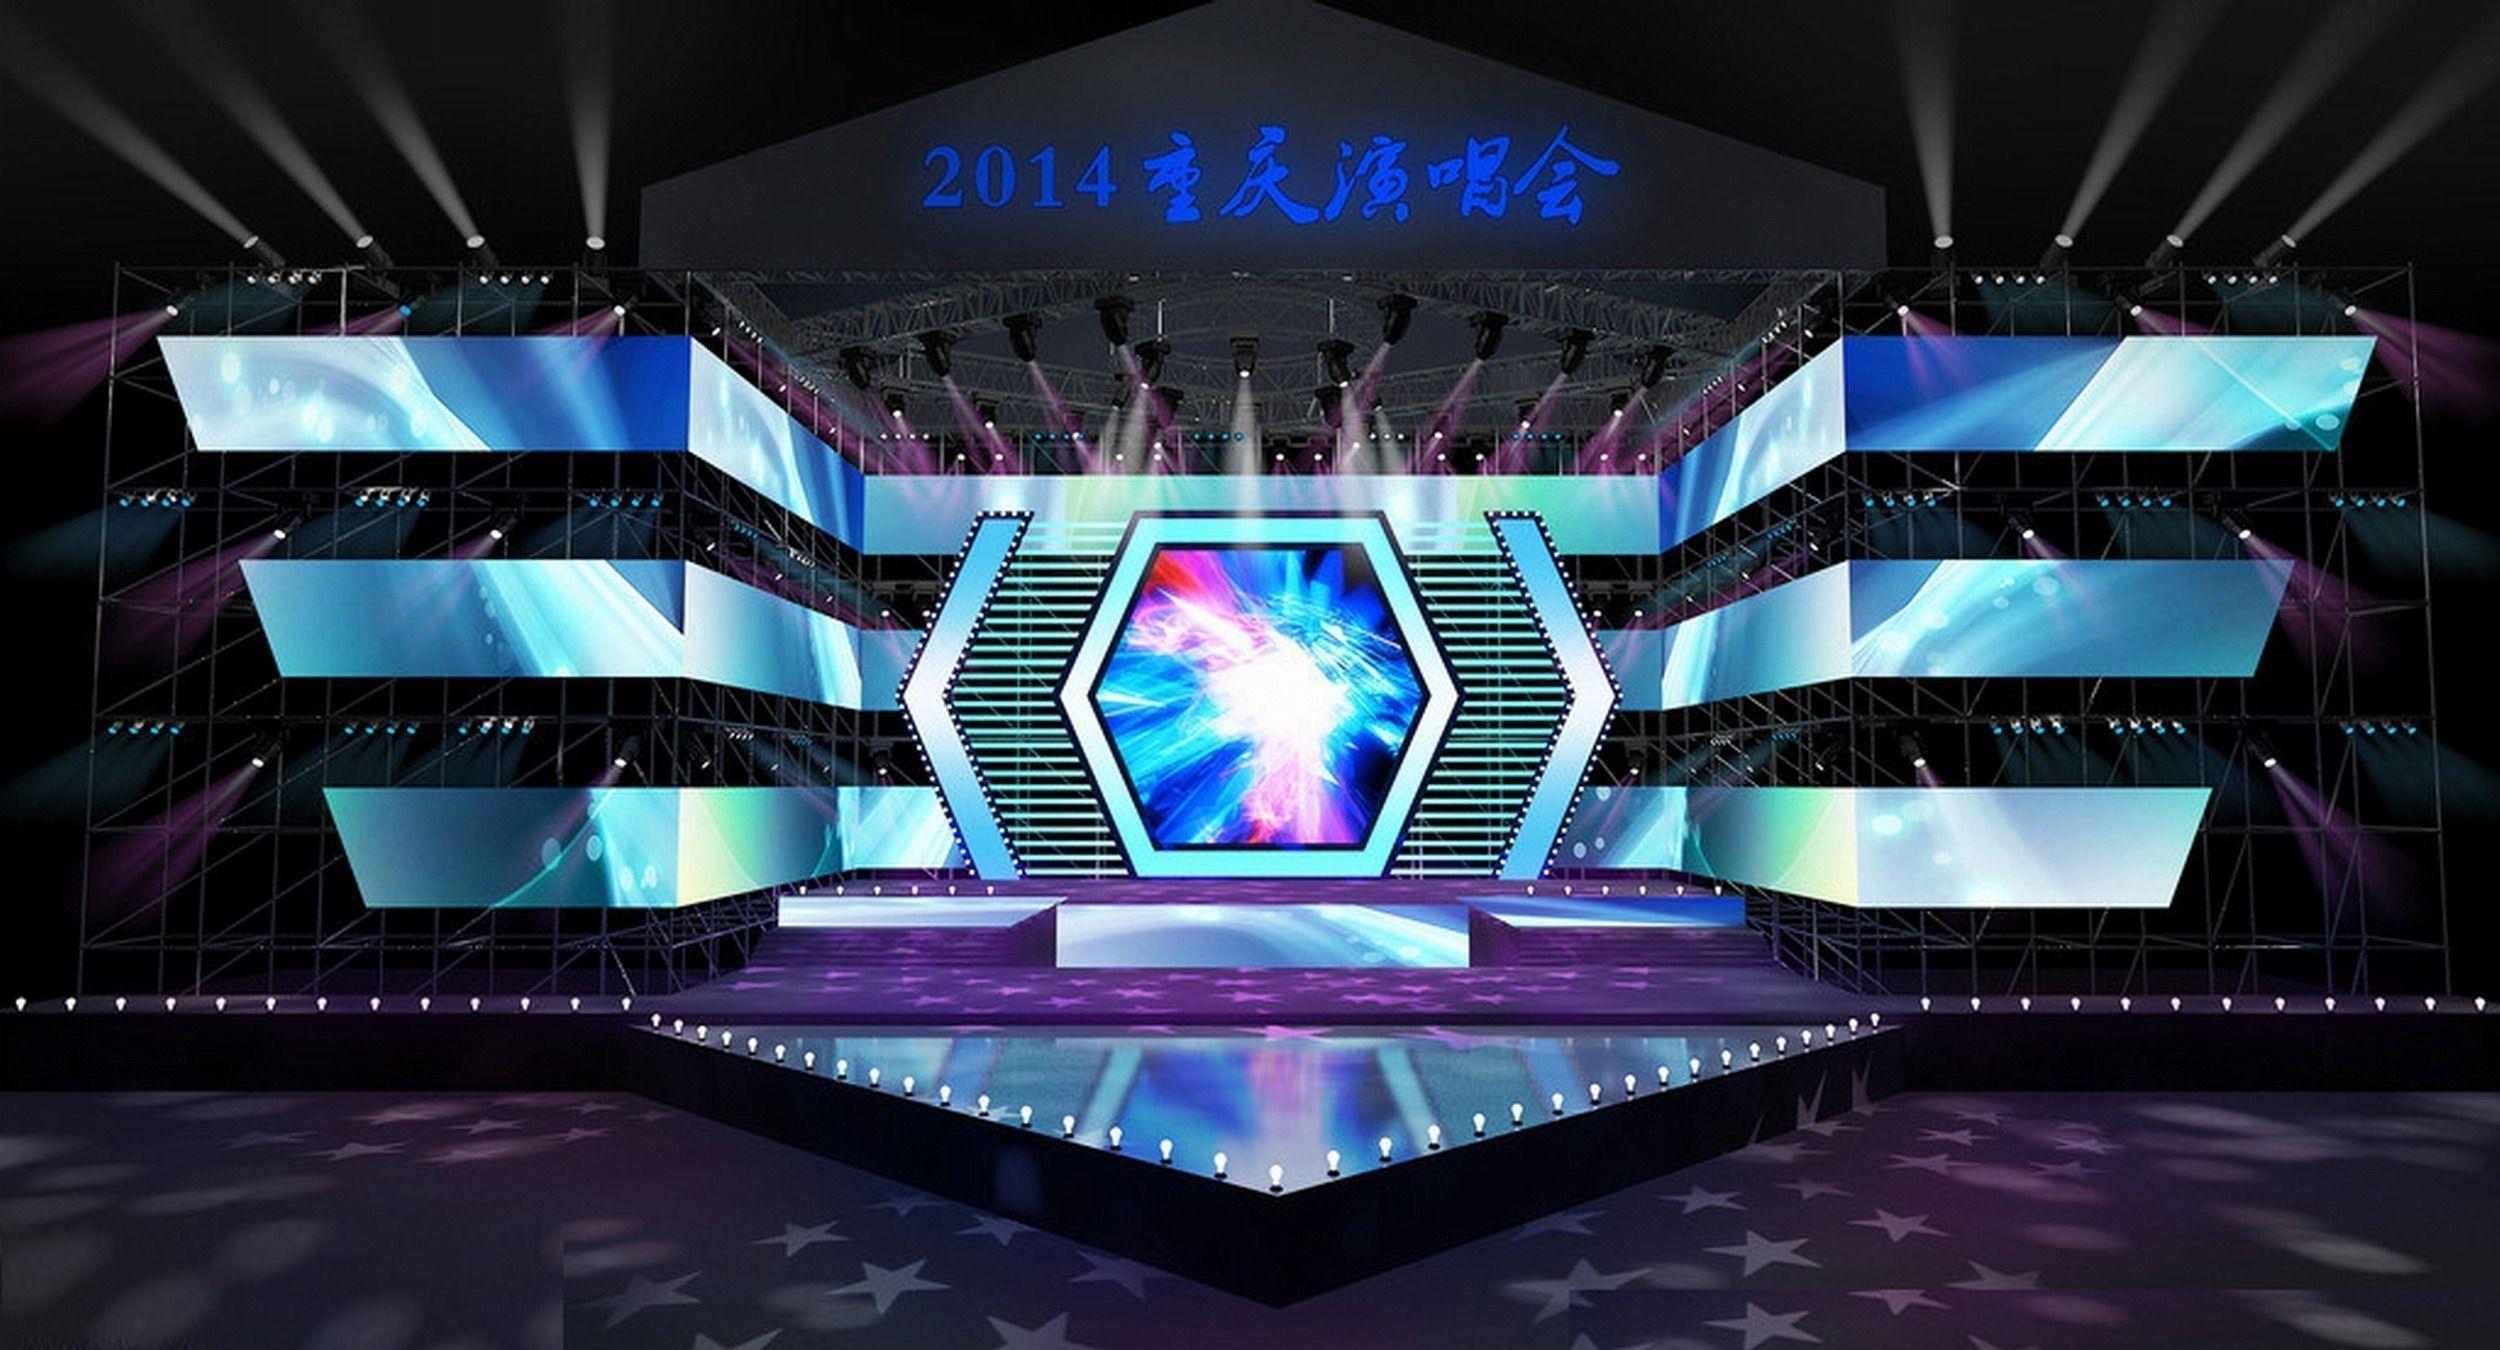 Exhibition Stand 3d Max Free Download : Concert stage design d model max obj mtl scena